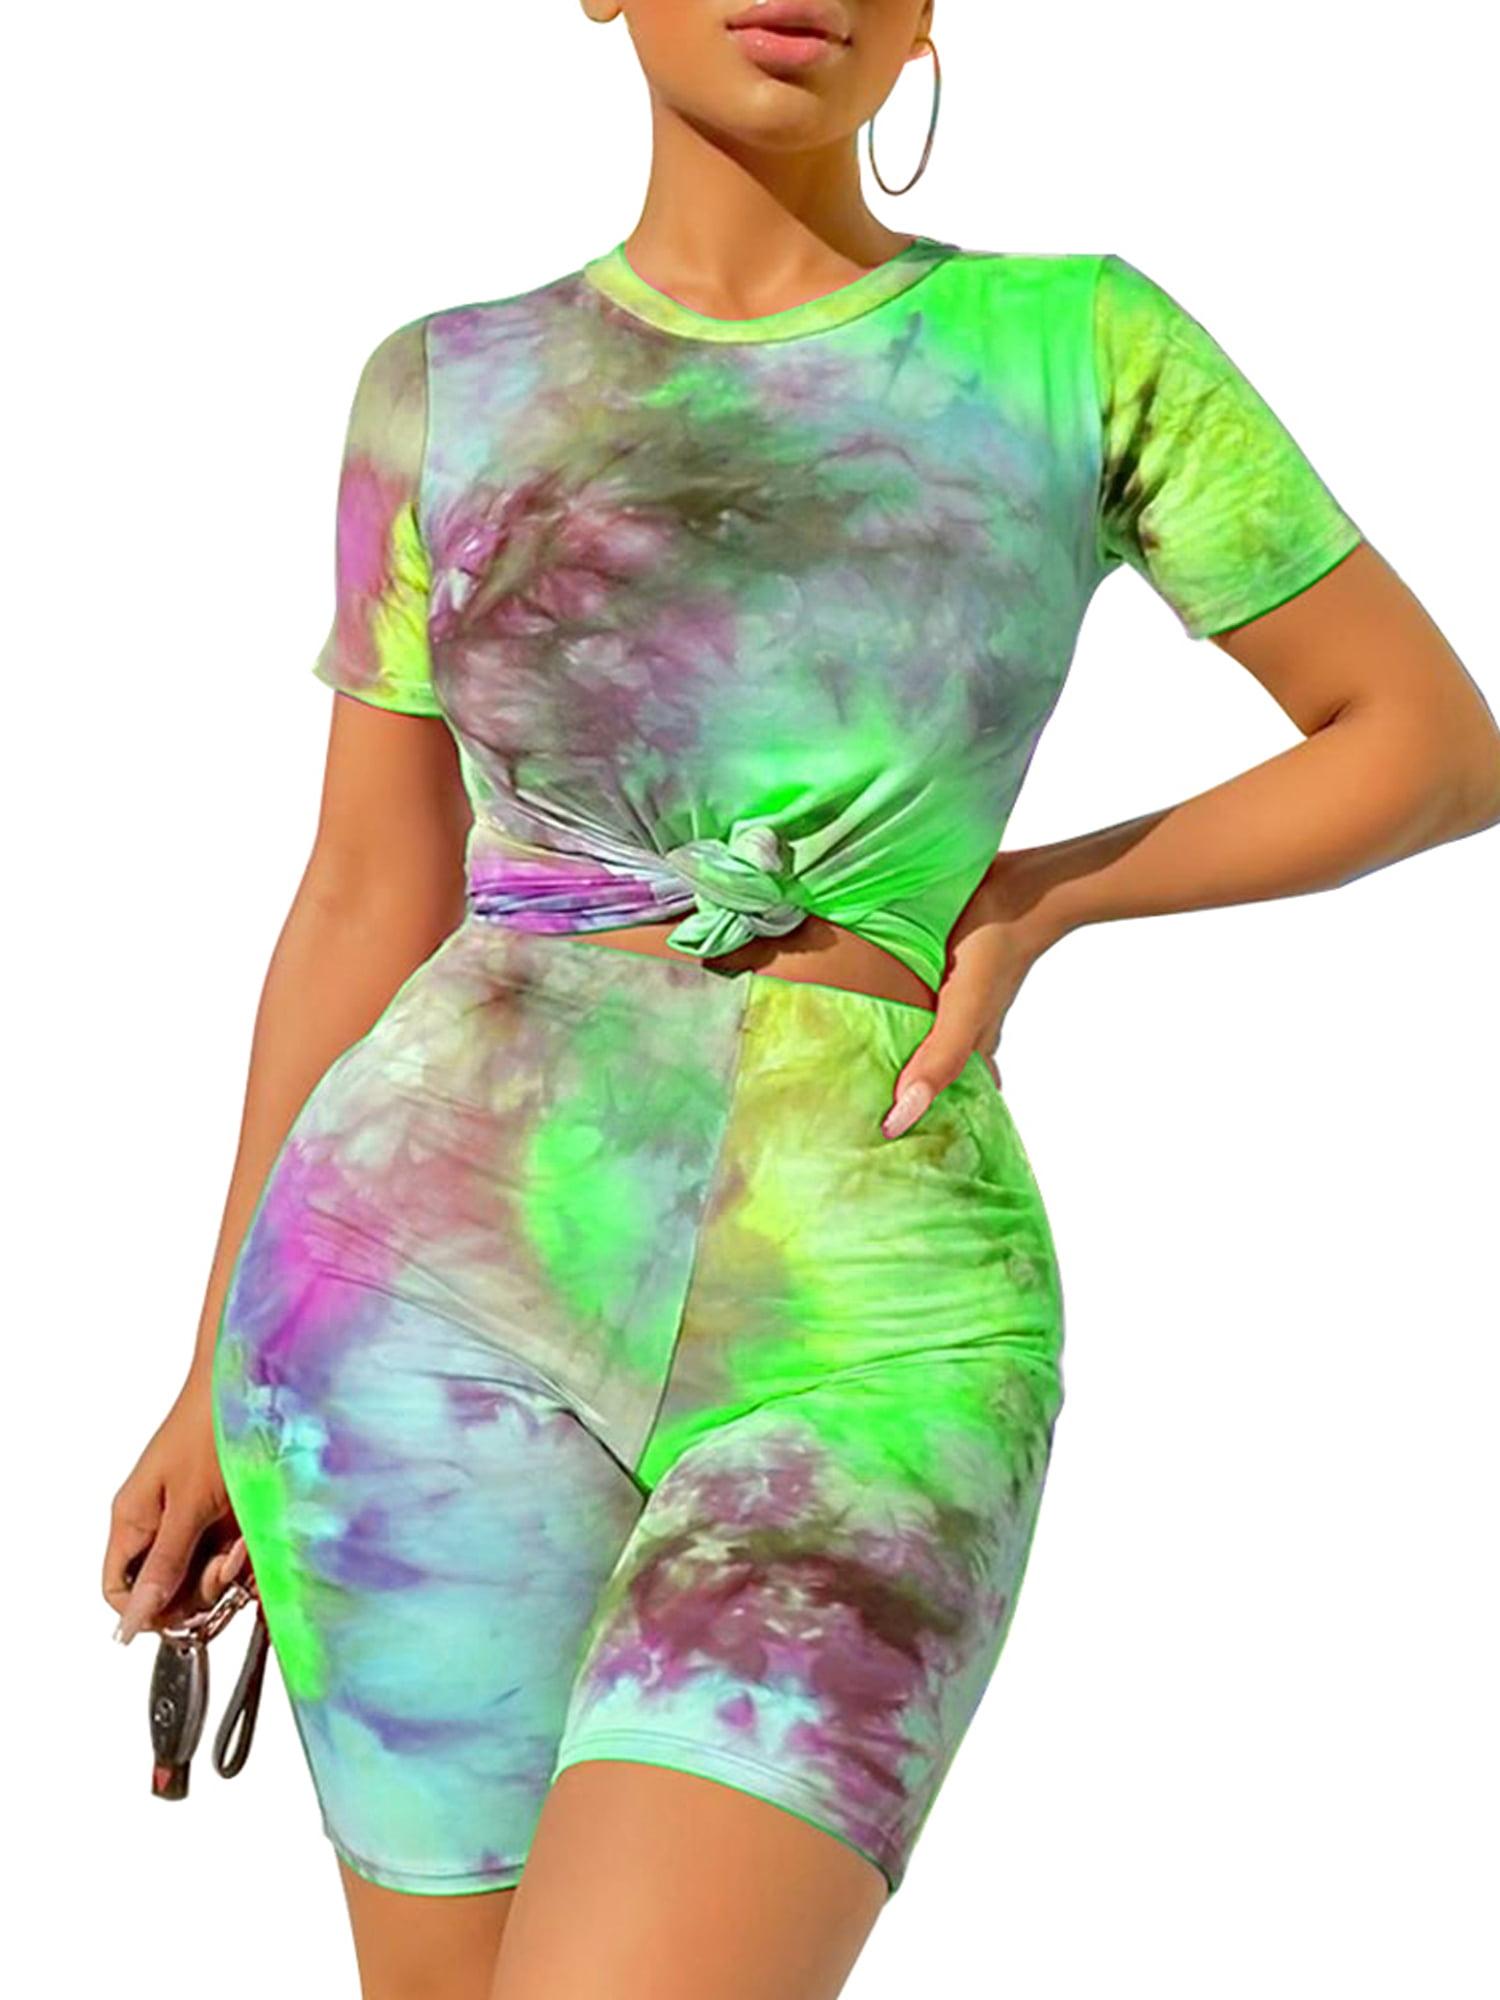 New Stylish Women Short Sleeves V Neck Tie Dye Print Casual Jumpsuit 2pcs Sport